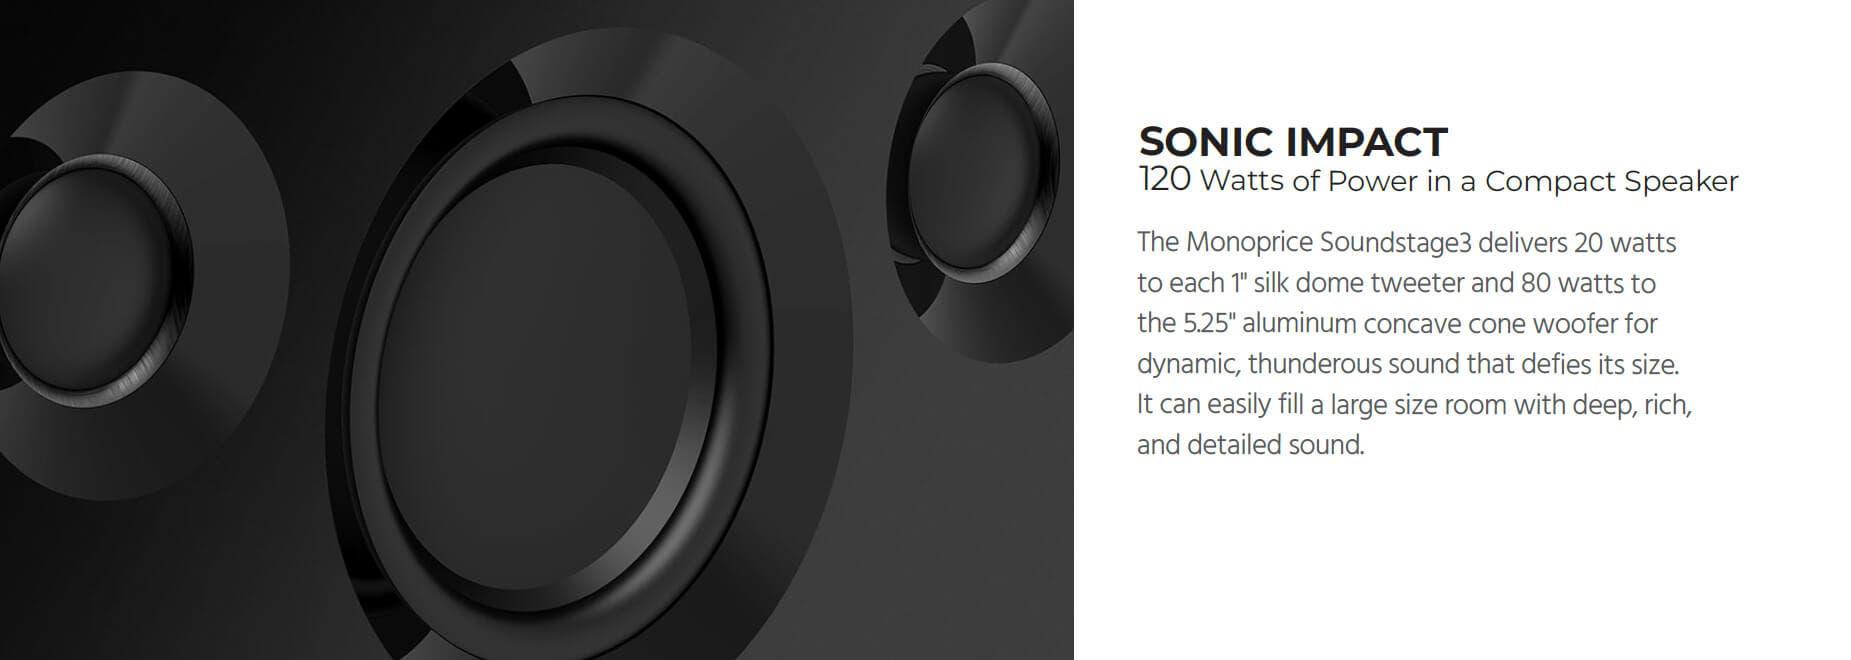 Monoprice Soundstage3 120 Watt True Wireless Stereo (TWS